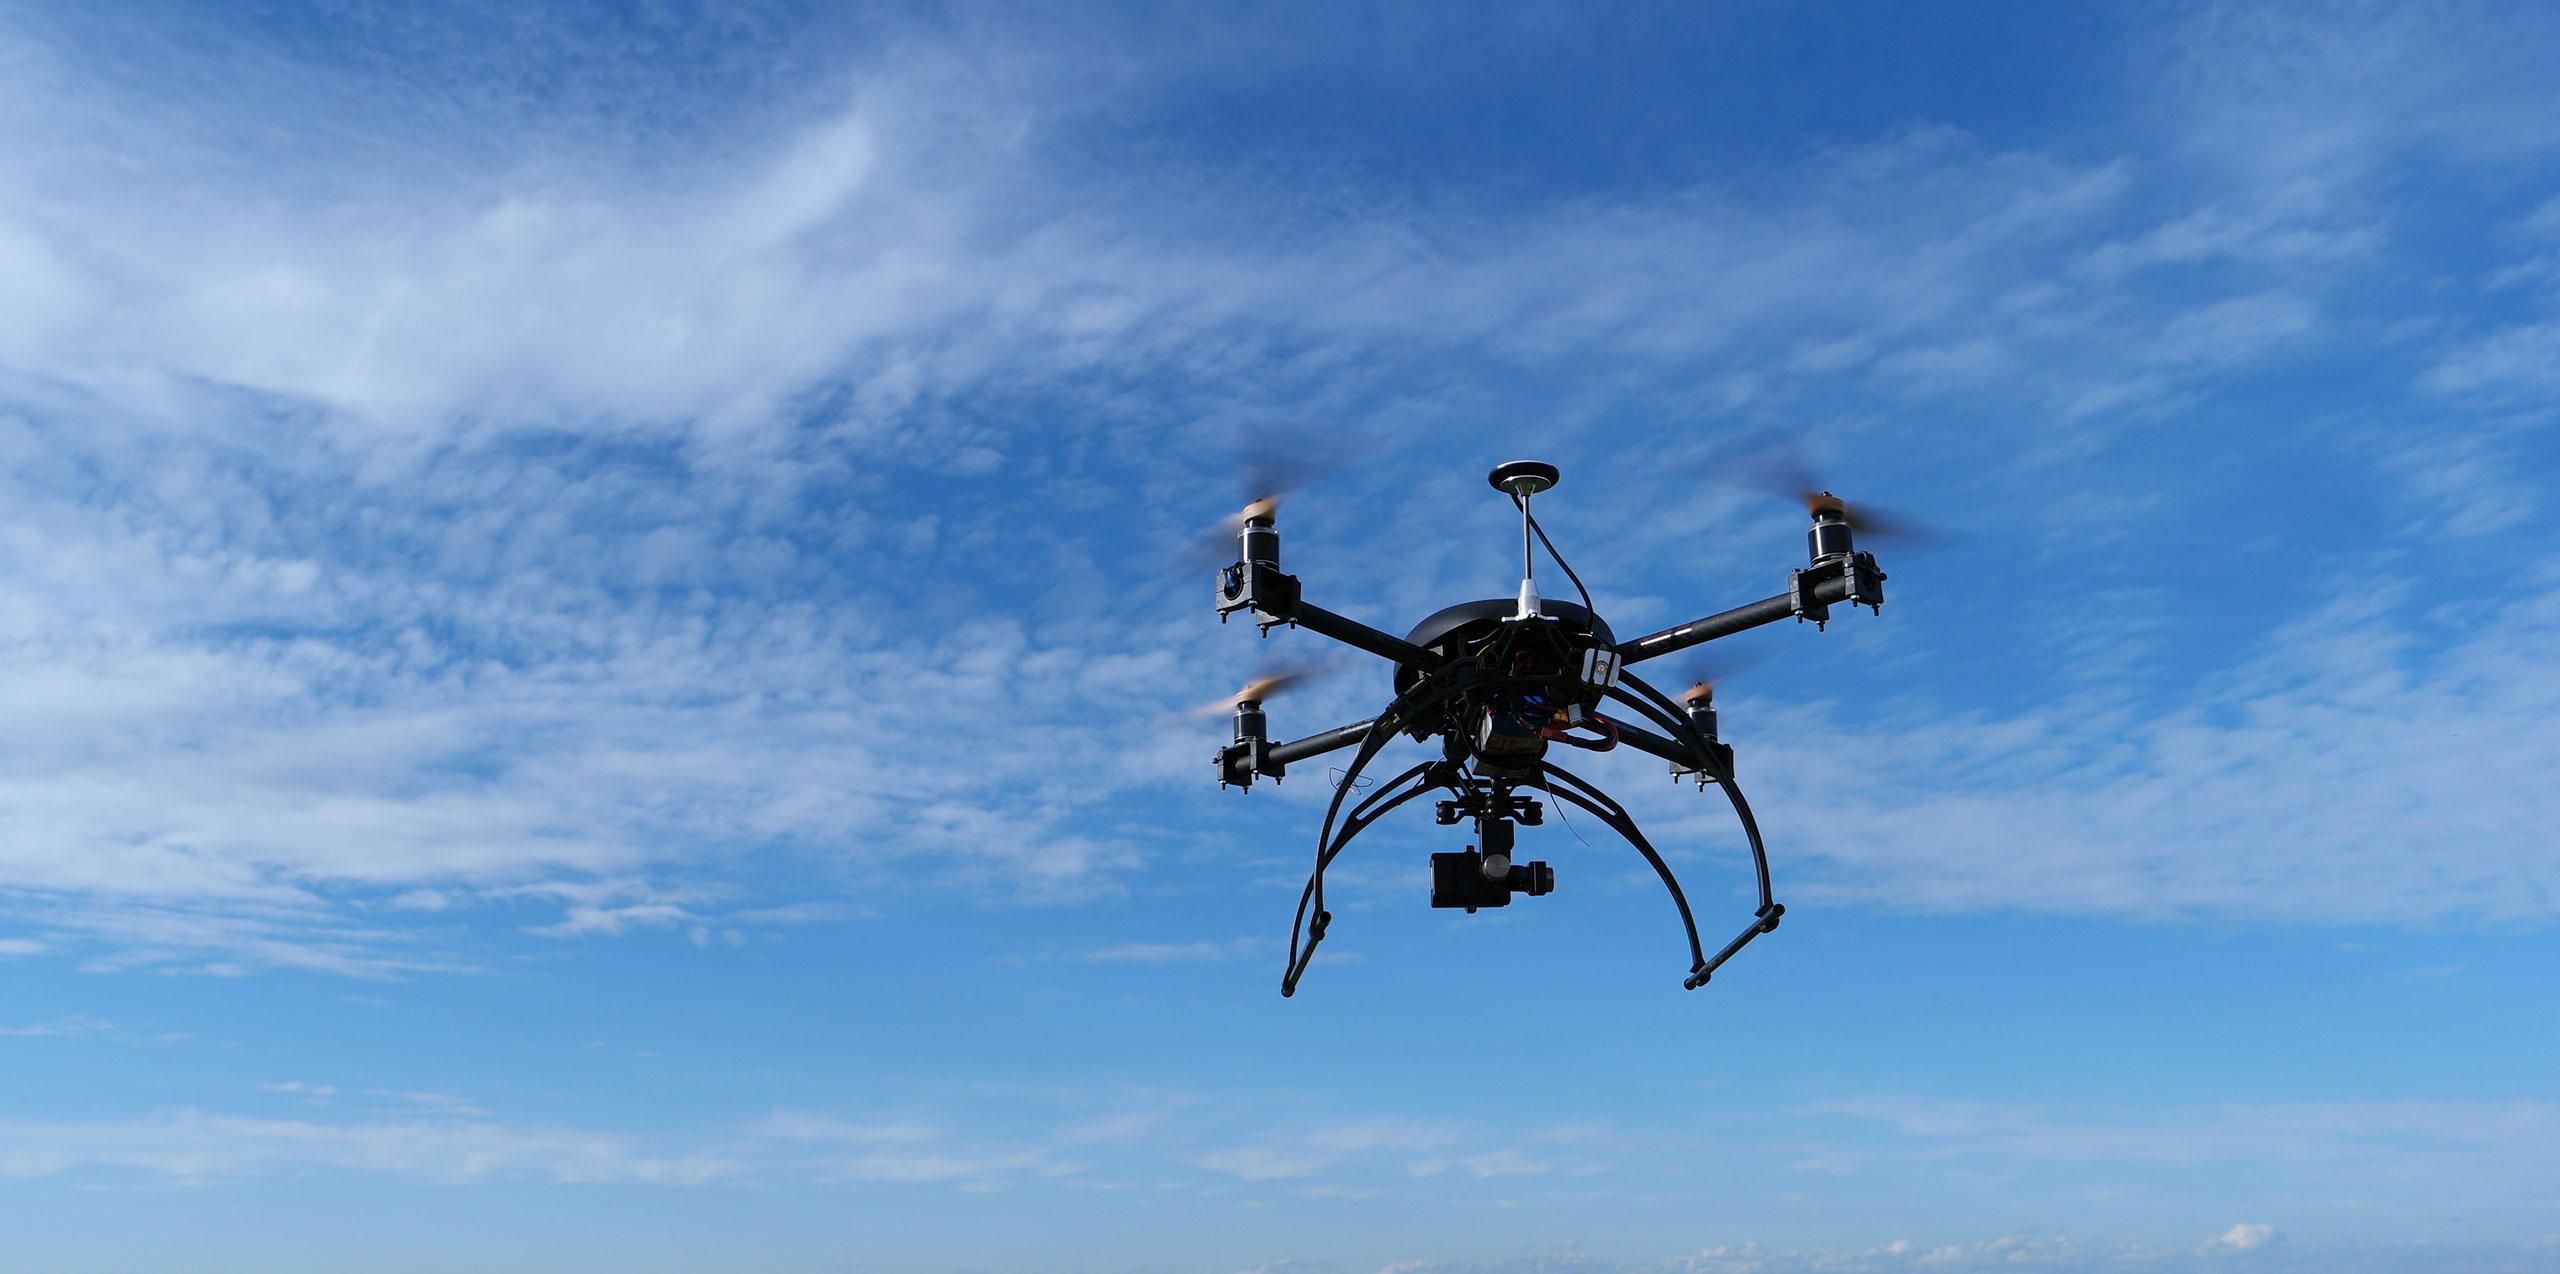 helipic photographie photo video drone sud ouest toulouse haute garonne ari ge aude. Black Bedroom Furniture Sets. Home Design Ideas